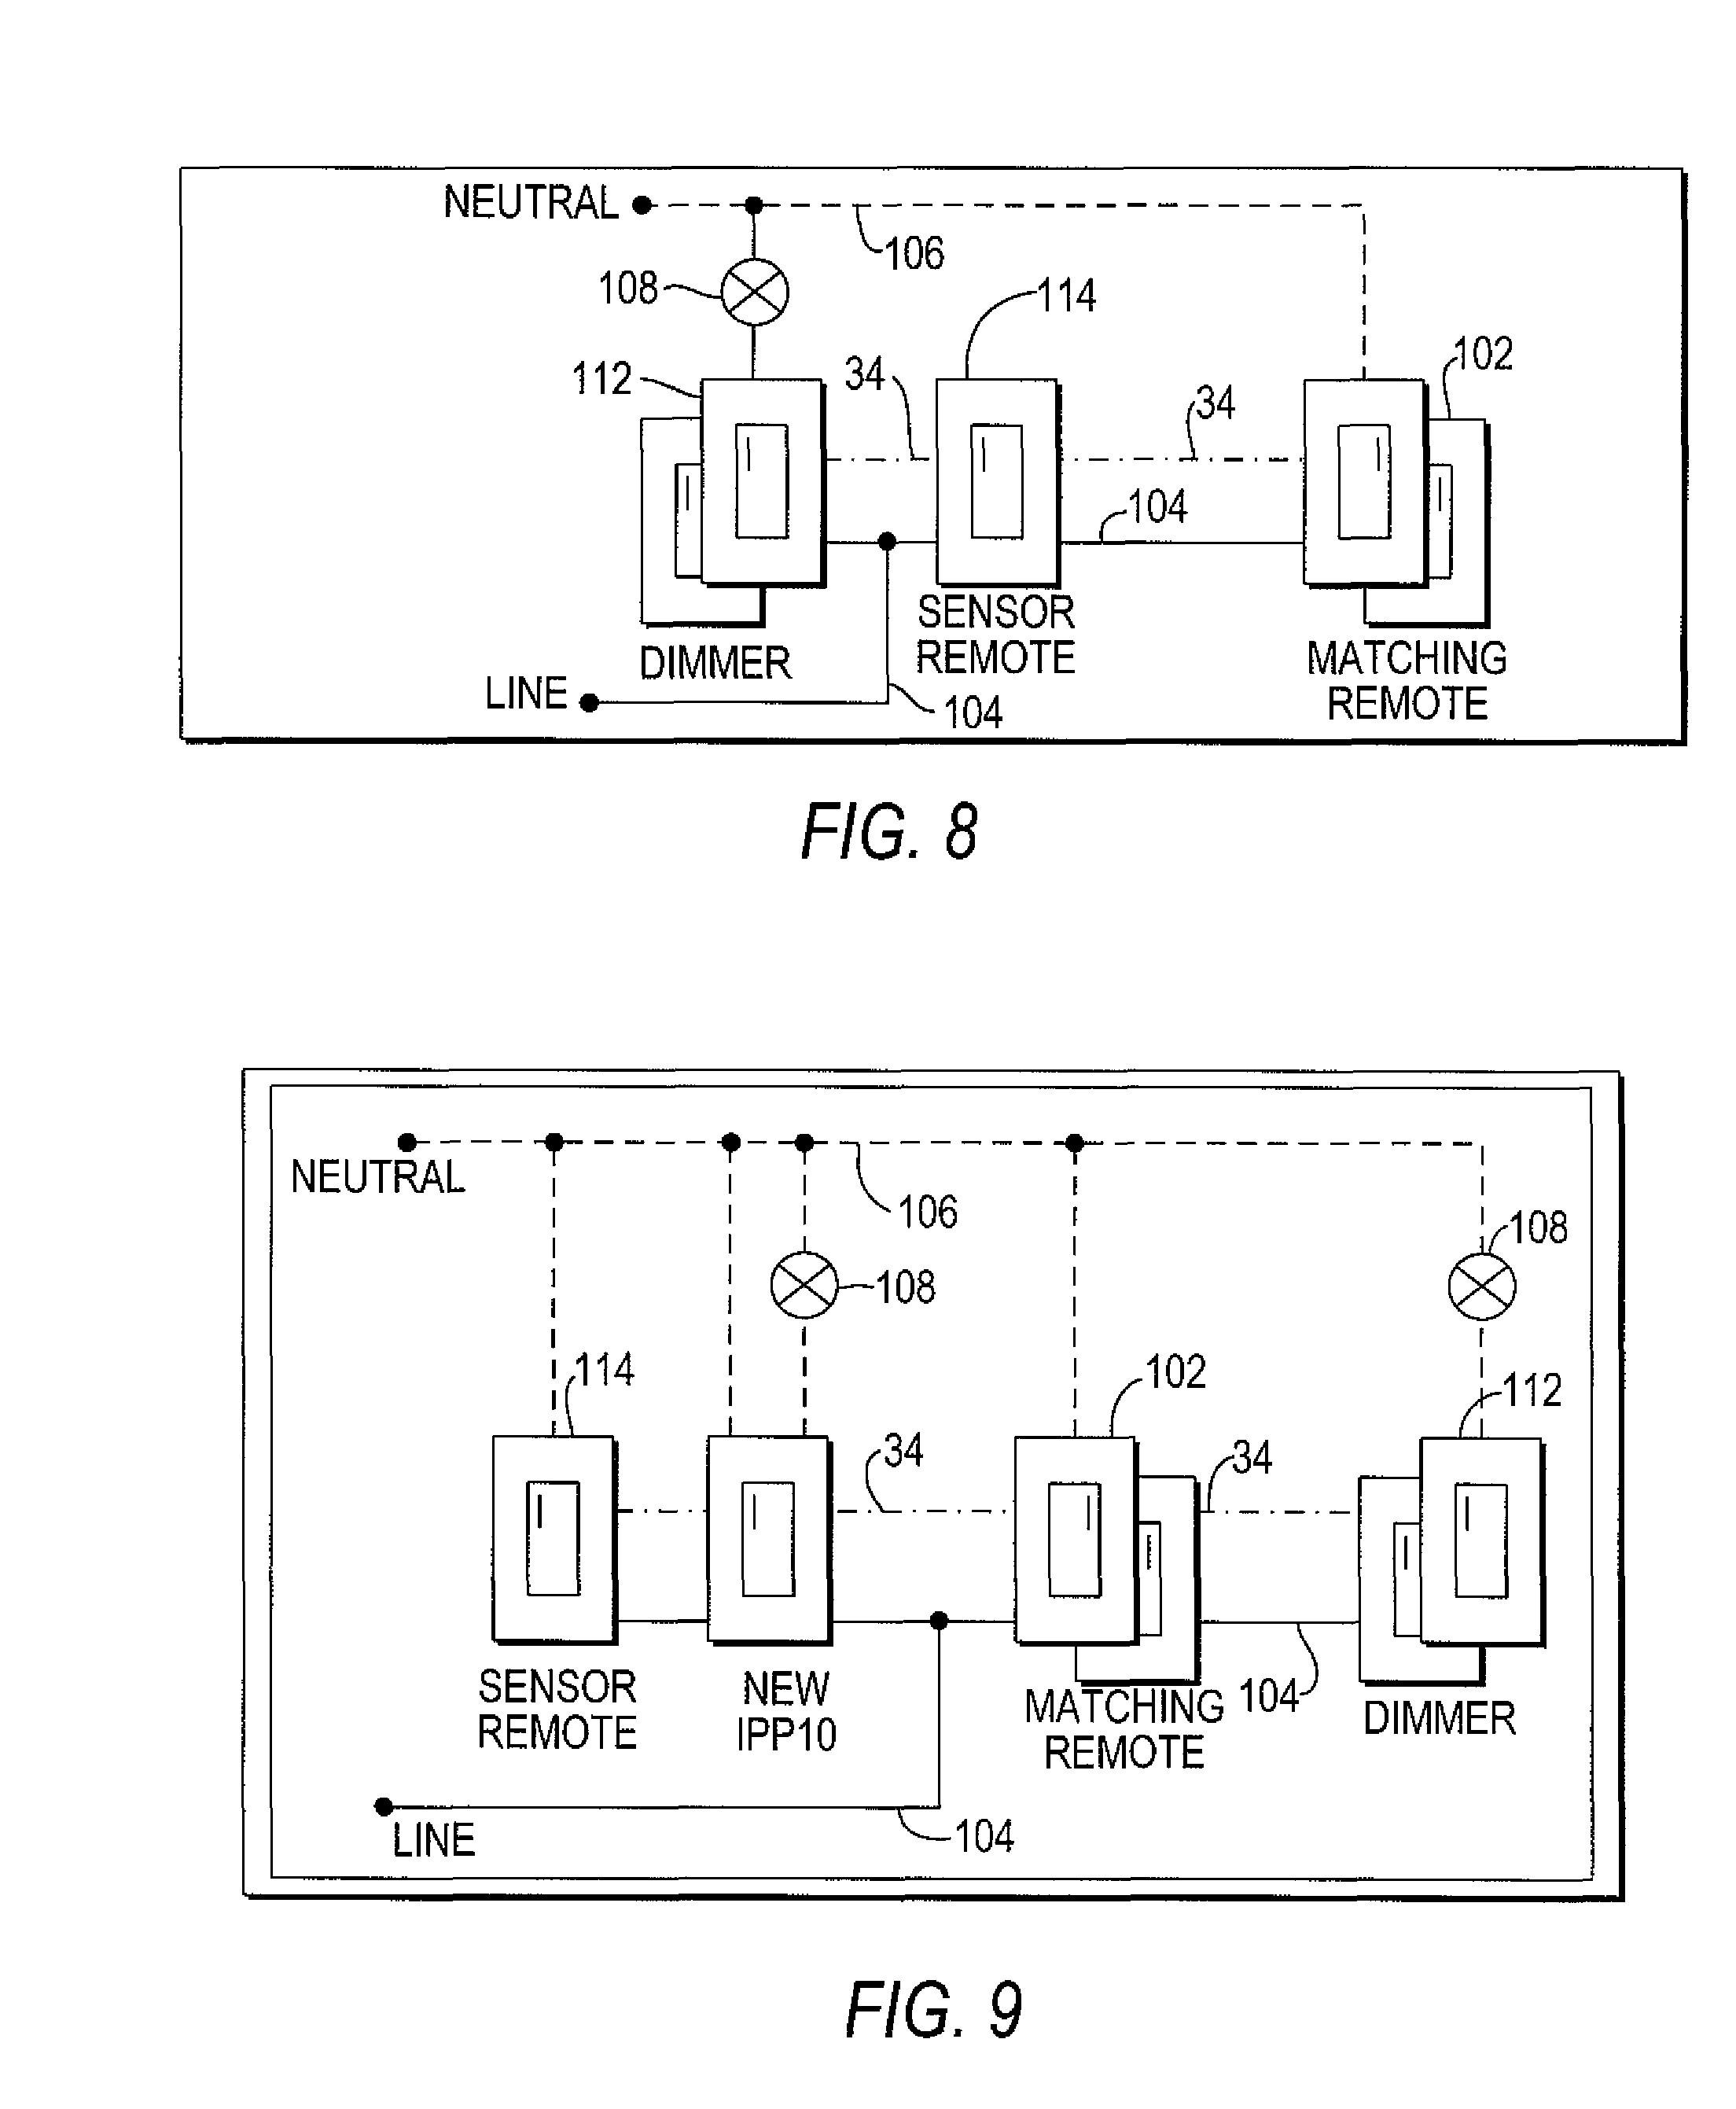 Lutron Ma 600 Wiring Diagram Unusual Lutron Maestro Ma 600 Wiring Diagram Electrical and Diagrams